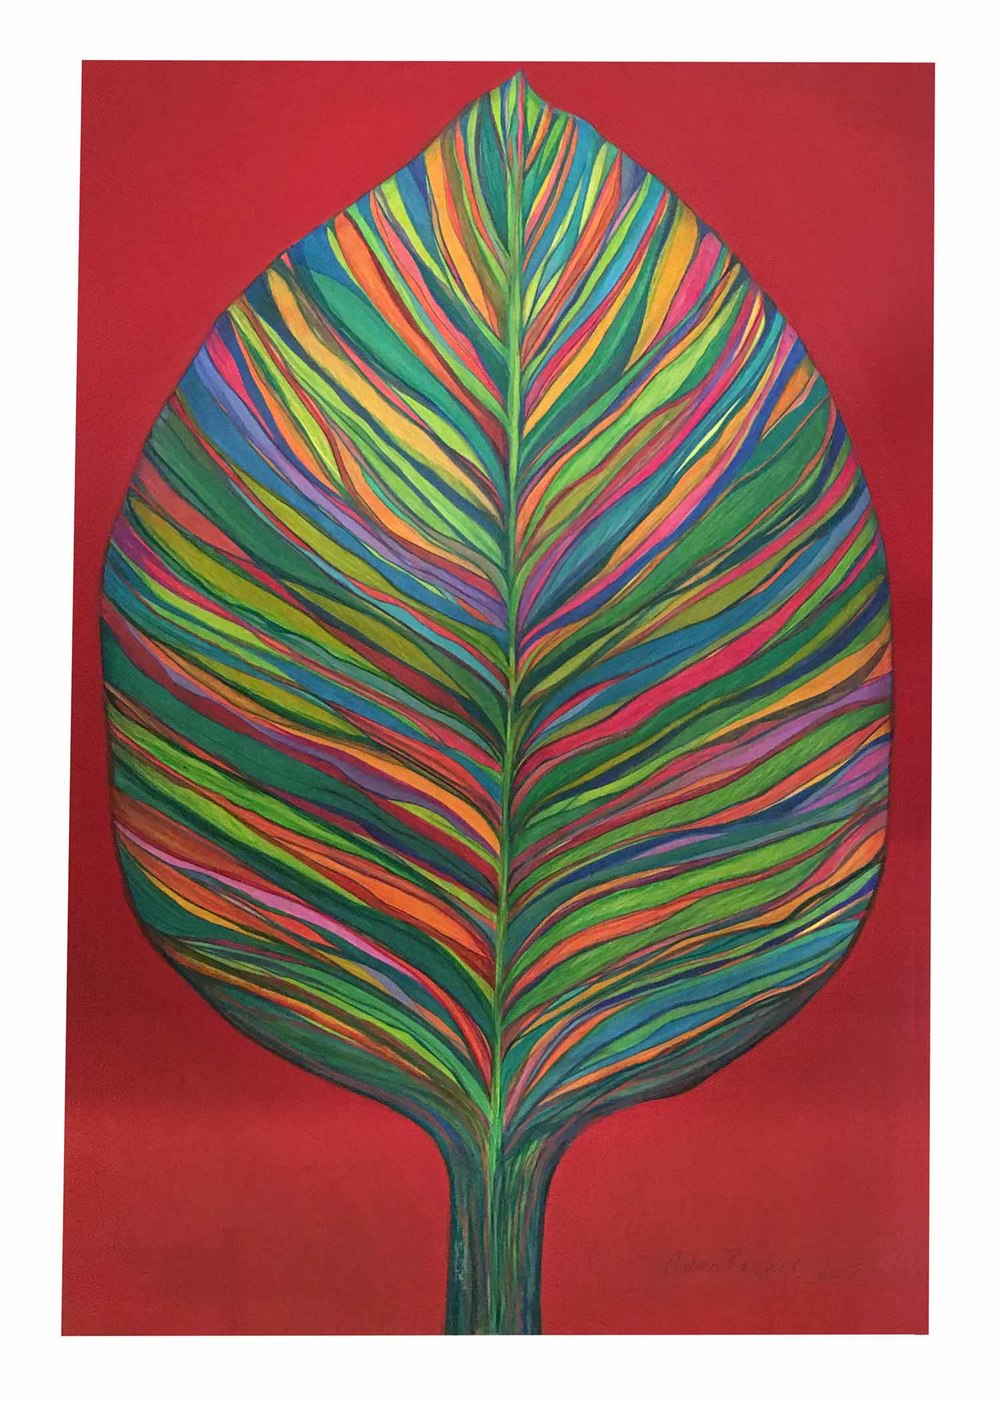 Leaf Form: Teal on Scarlett